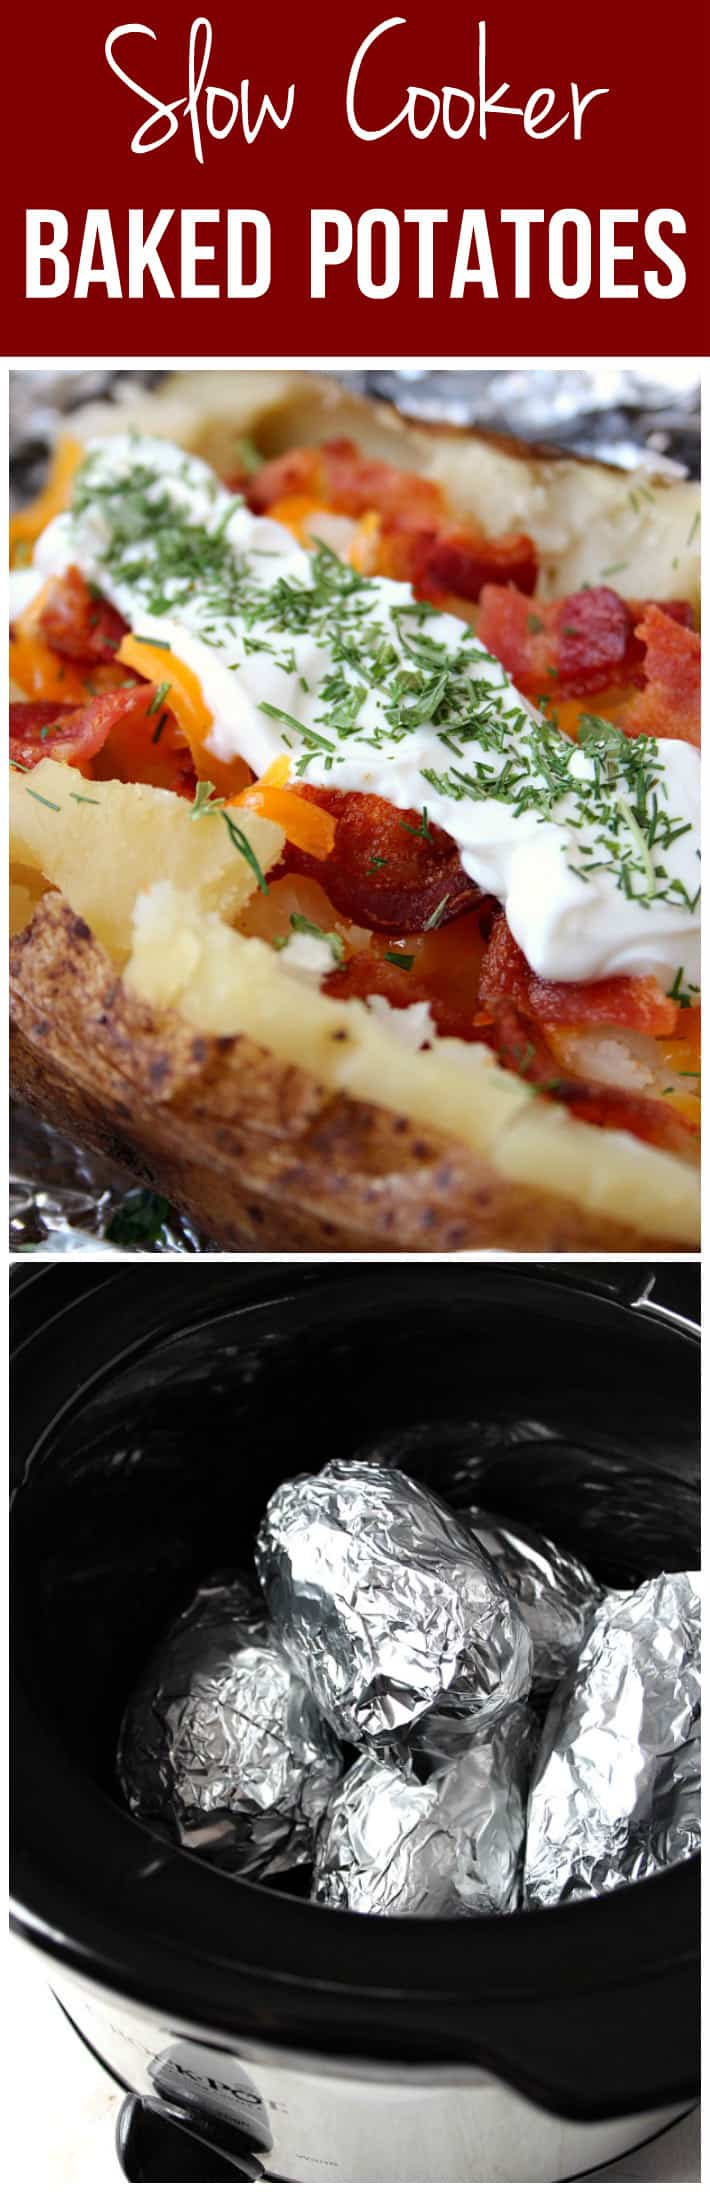 slow cooker baked potatoes recipe long3 Slow Cooker Baked Potatoes Recipe